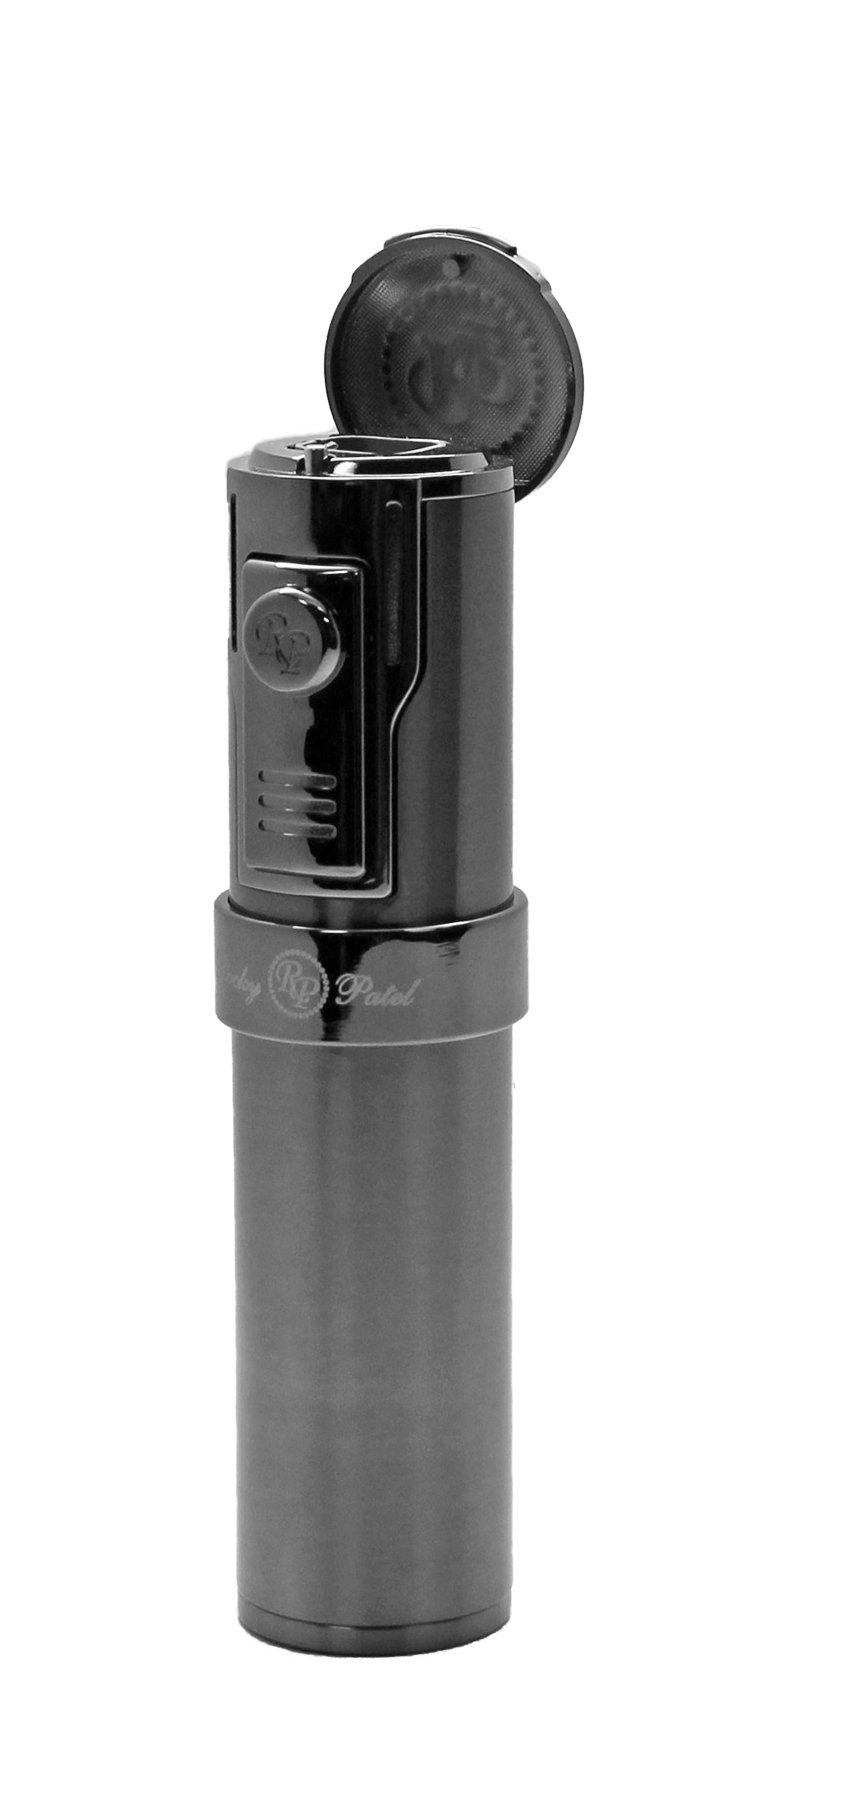 Rocky Patel Cigar Lighter Diplomat 5 Torch Lighters with Punch - Gun Metal